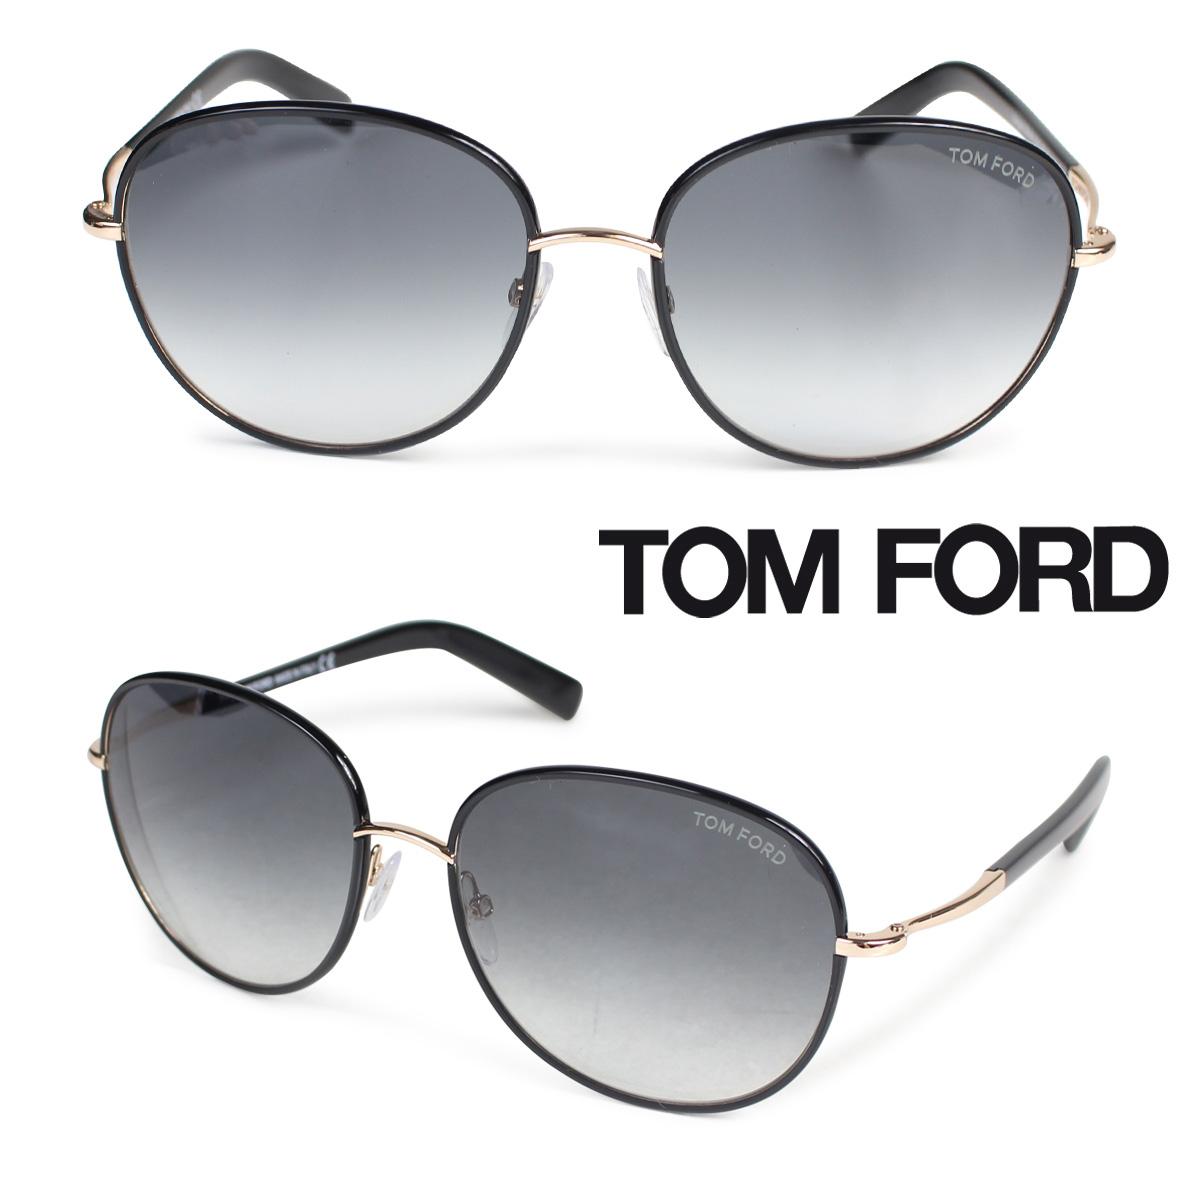 TOM FORD トムフォード サングラス メガネ メンズ レディース アイウェア FT0498 GEORGIA SUNGLASSES ブラック 黒